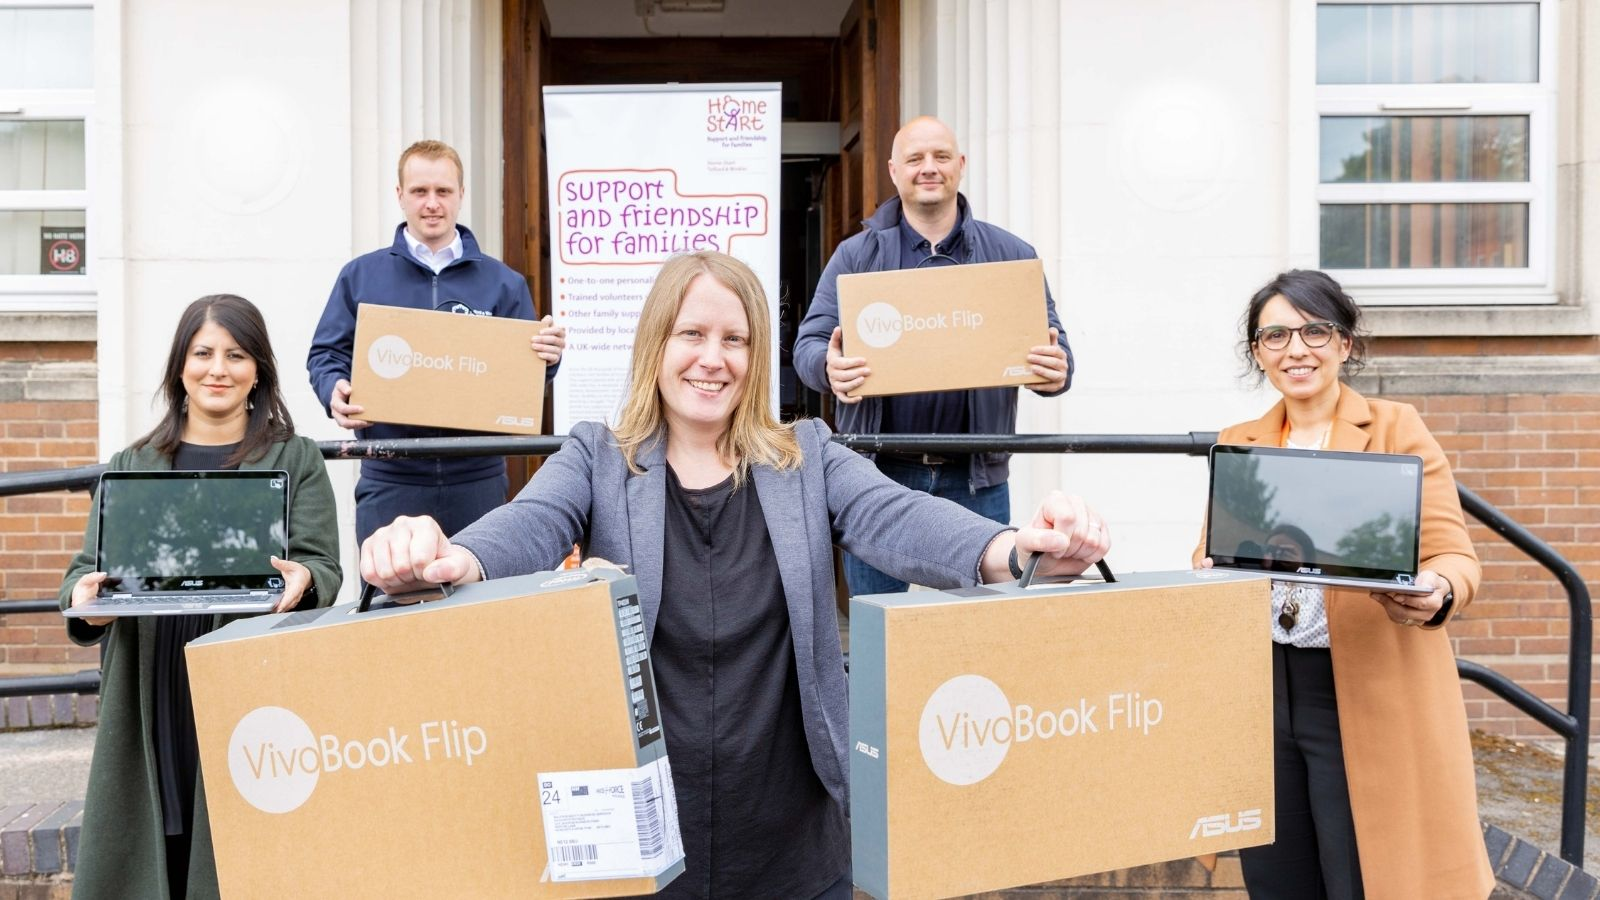 Telford & Wrekin Council Working in Partnership to combat digital exclusion